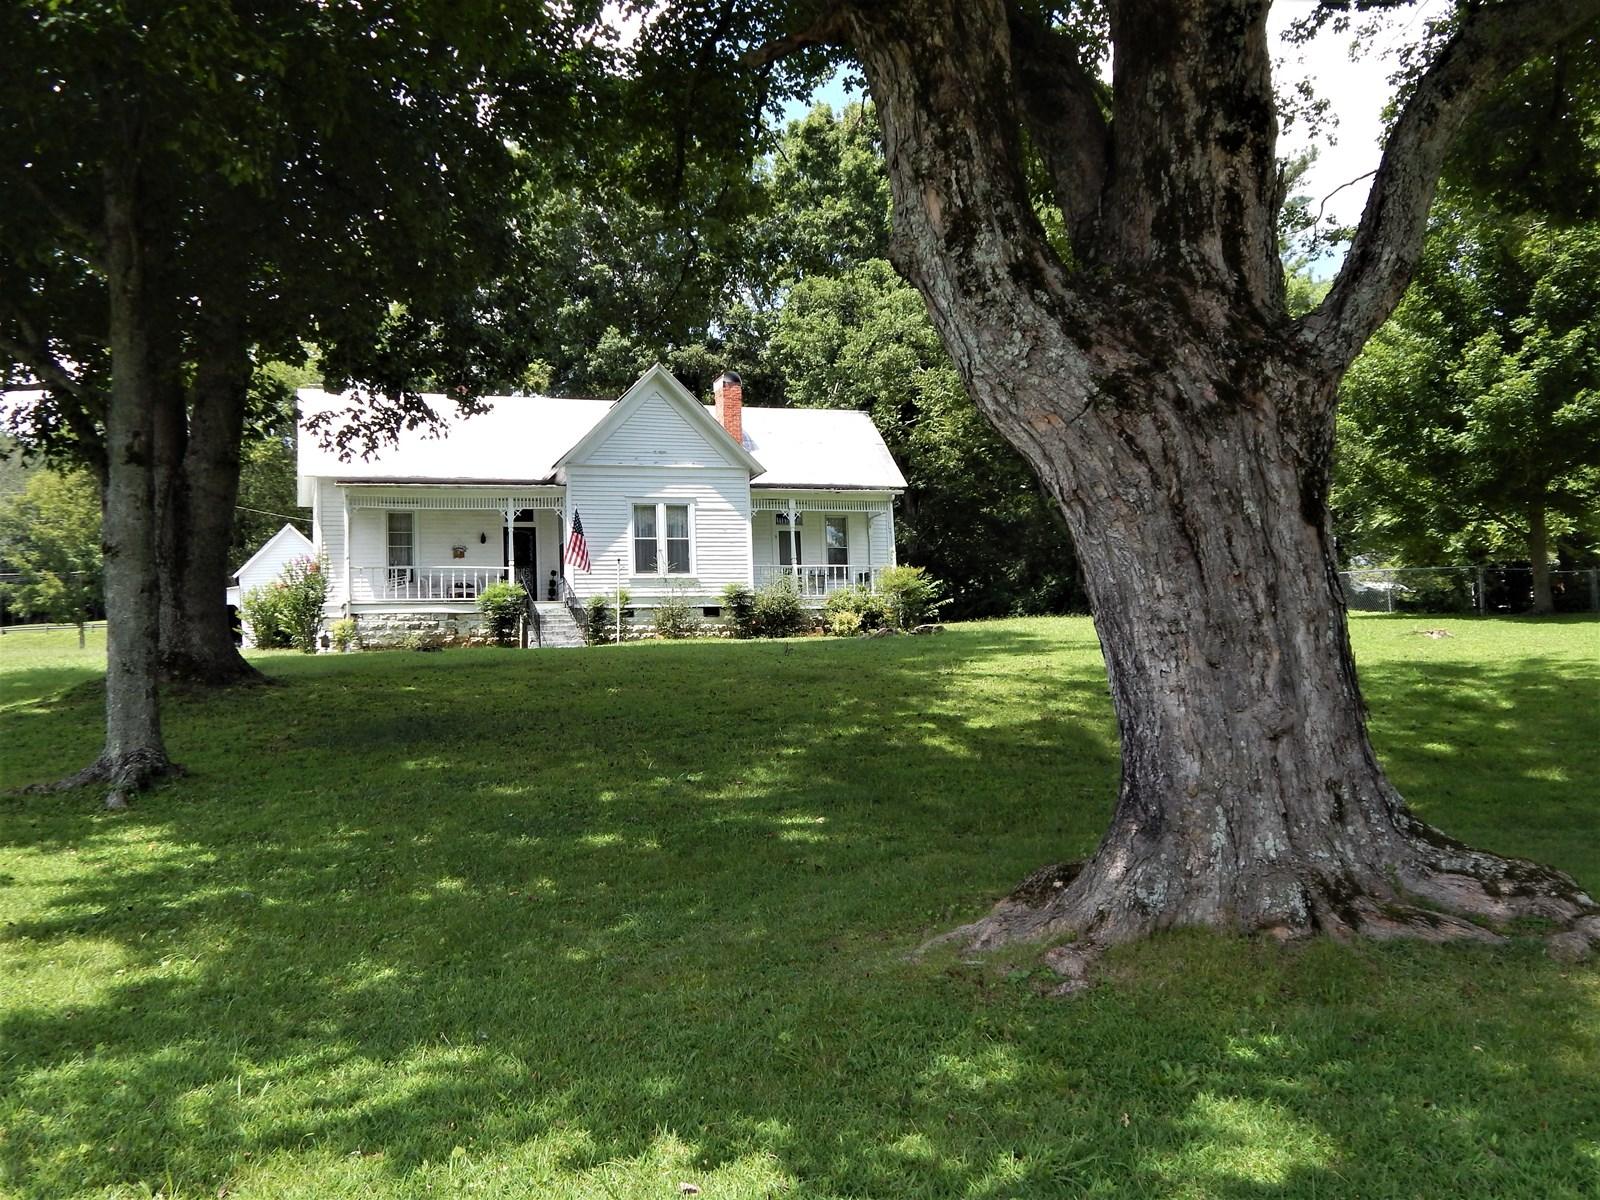 HISTORIC WAYNESBORO, TN. HOME, 3 BED 1 BATH, ON 1.03 ACRE!